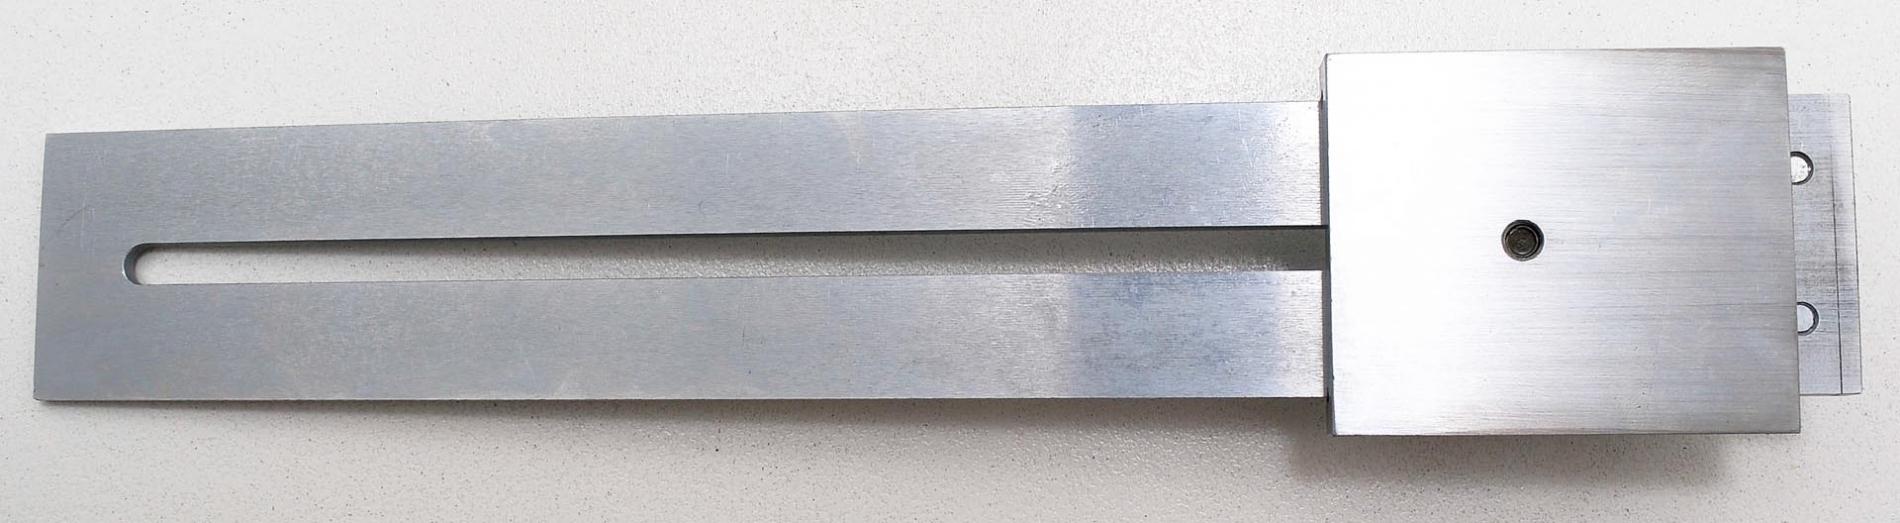 7120-200A-Gramil regla de precision para marcar 0-200mm INSIZE 7120-200A-max-9.